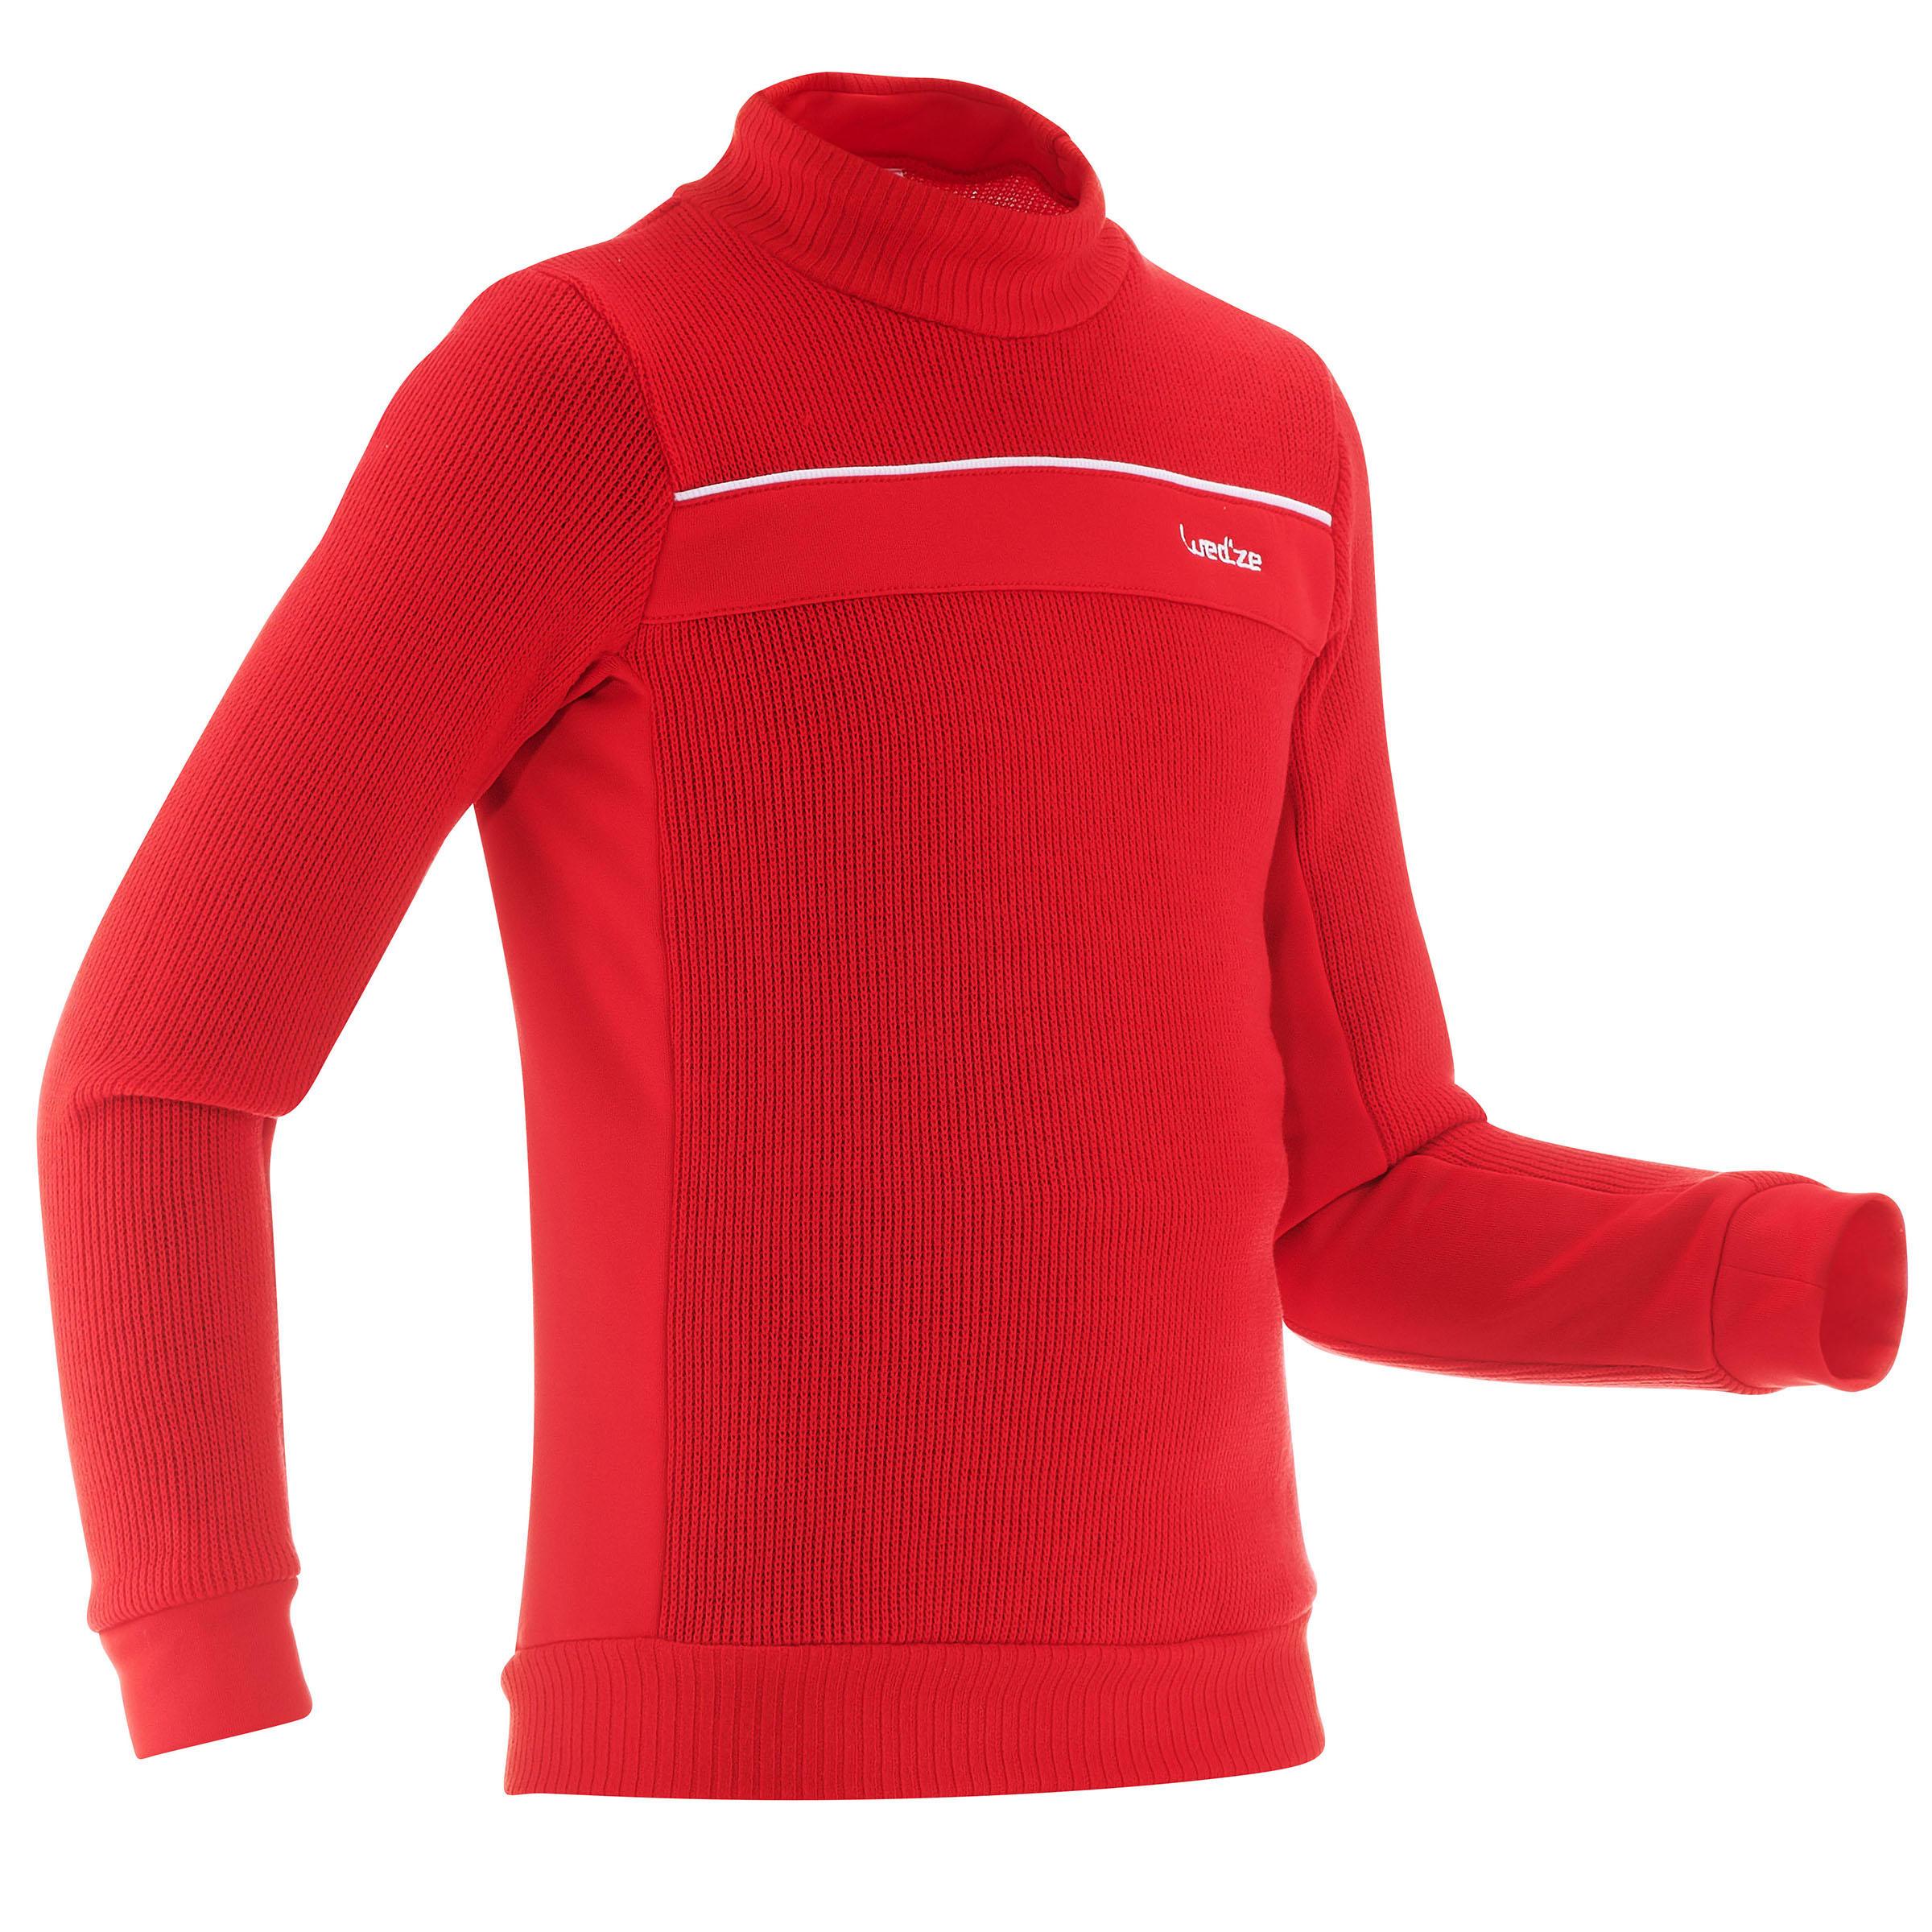 87f51e3be Comprar Camiseta Térmica de Esquí Niños online